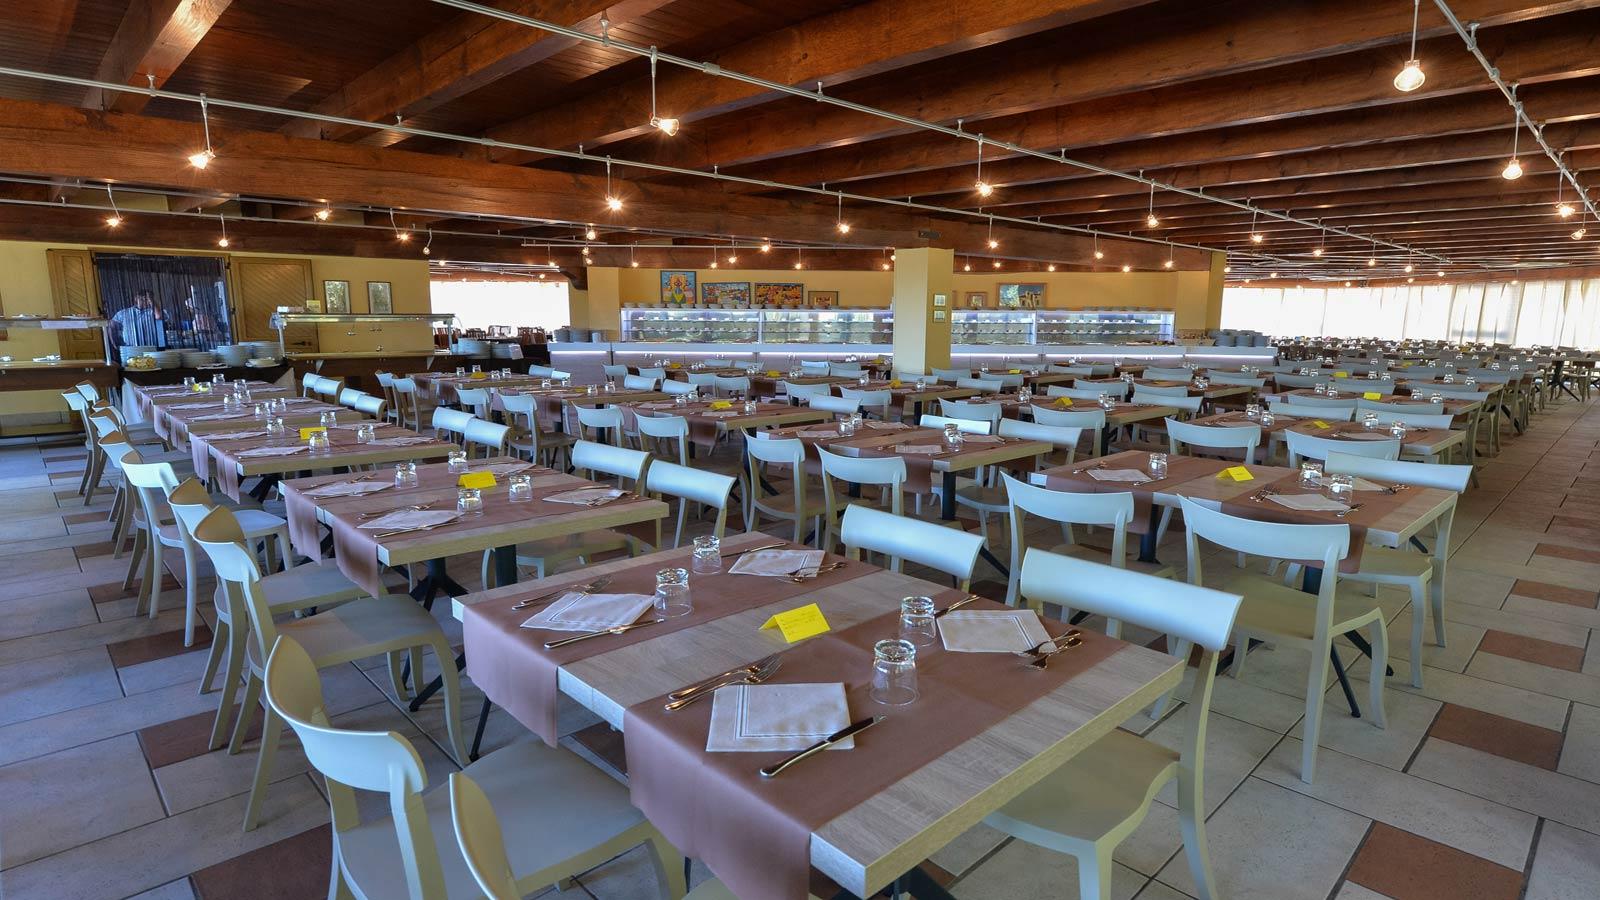 vascellero-club-resort-cariati-marina-ristorante-1-1